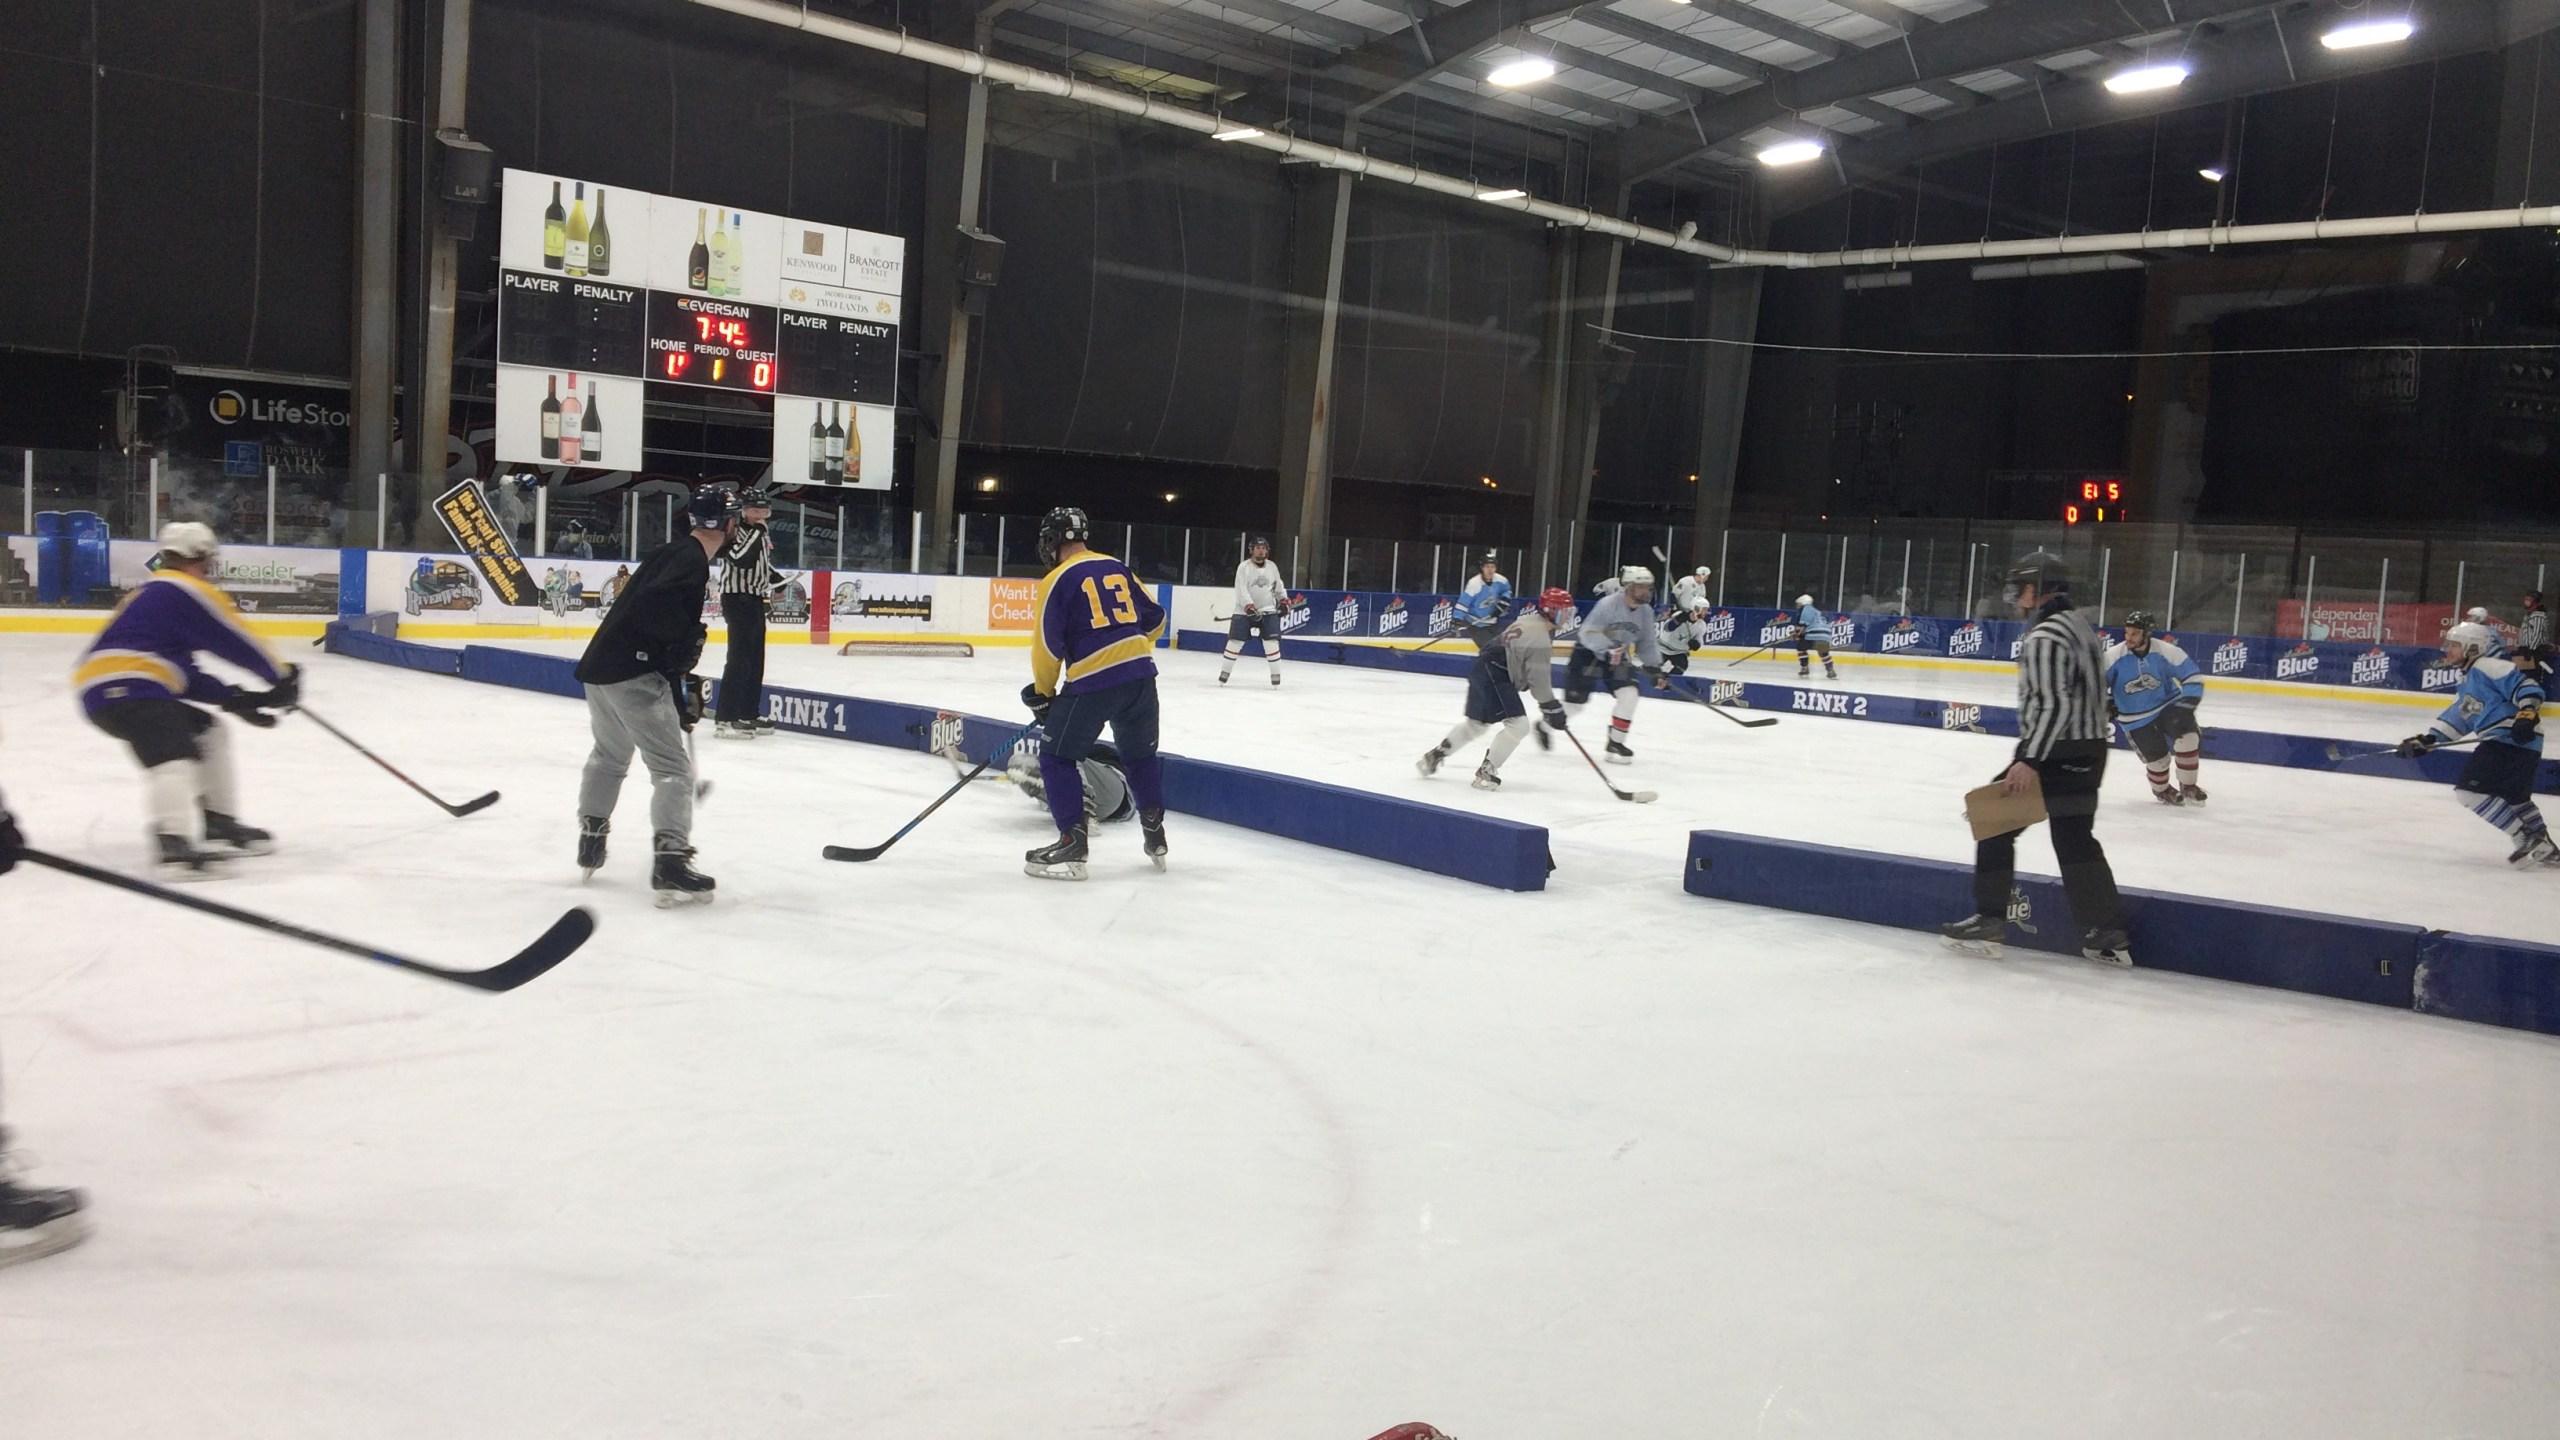 Registration For 2019 Labatt Blue Buffalo Pond Hockey Tournament